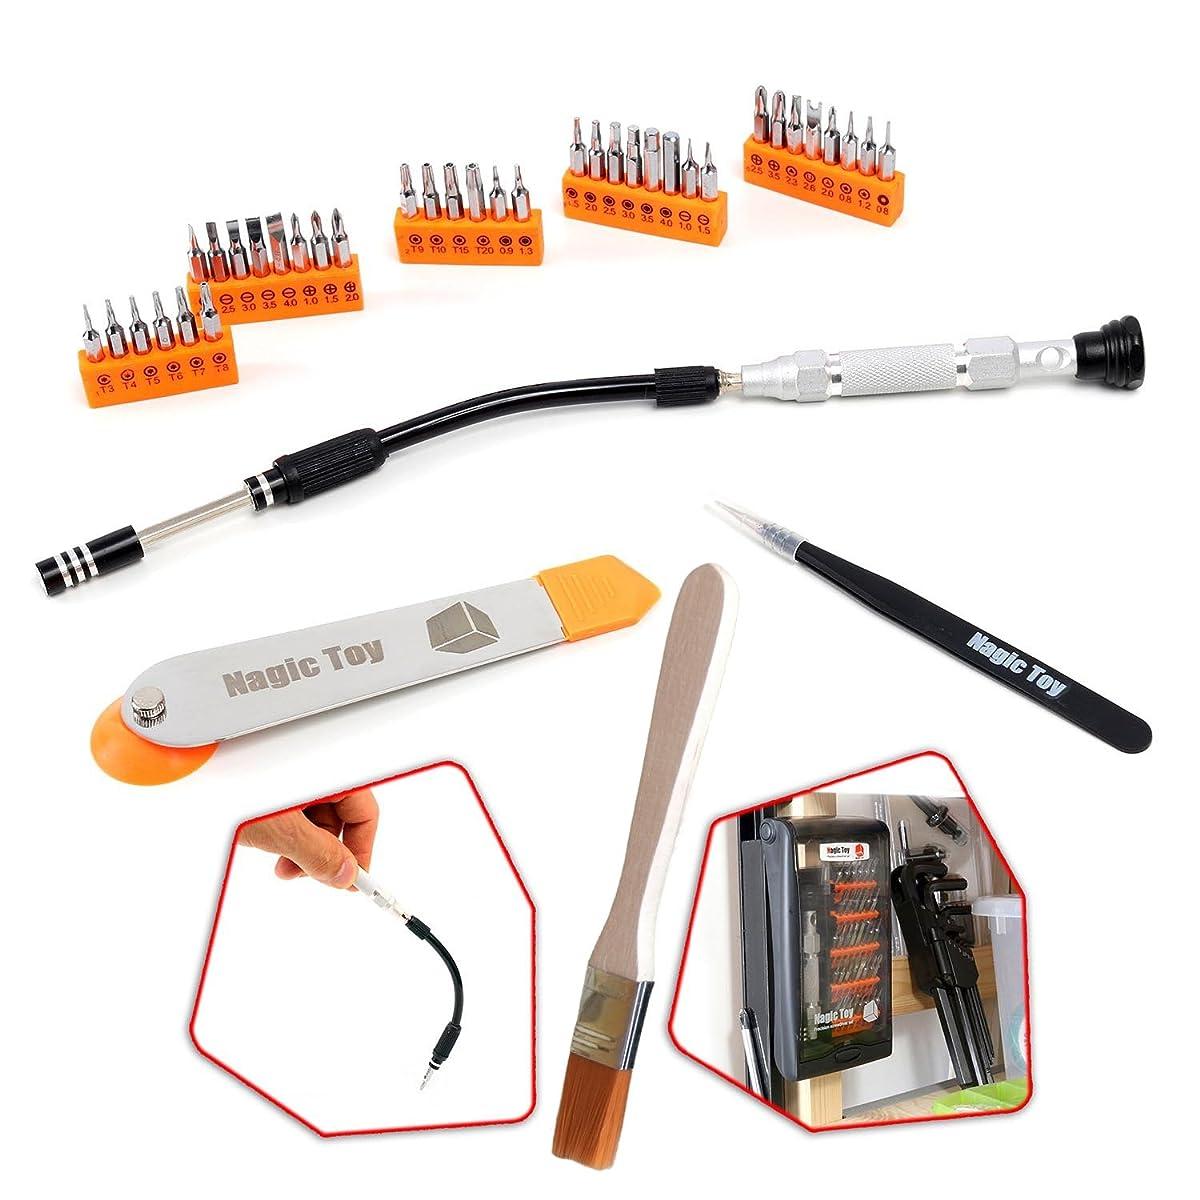 Precision IT Screwdriver bit set - For Phone Laptop Electronics - Magnetic Driver Kit- Pentalobe & Security Torx